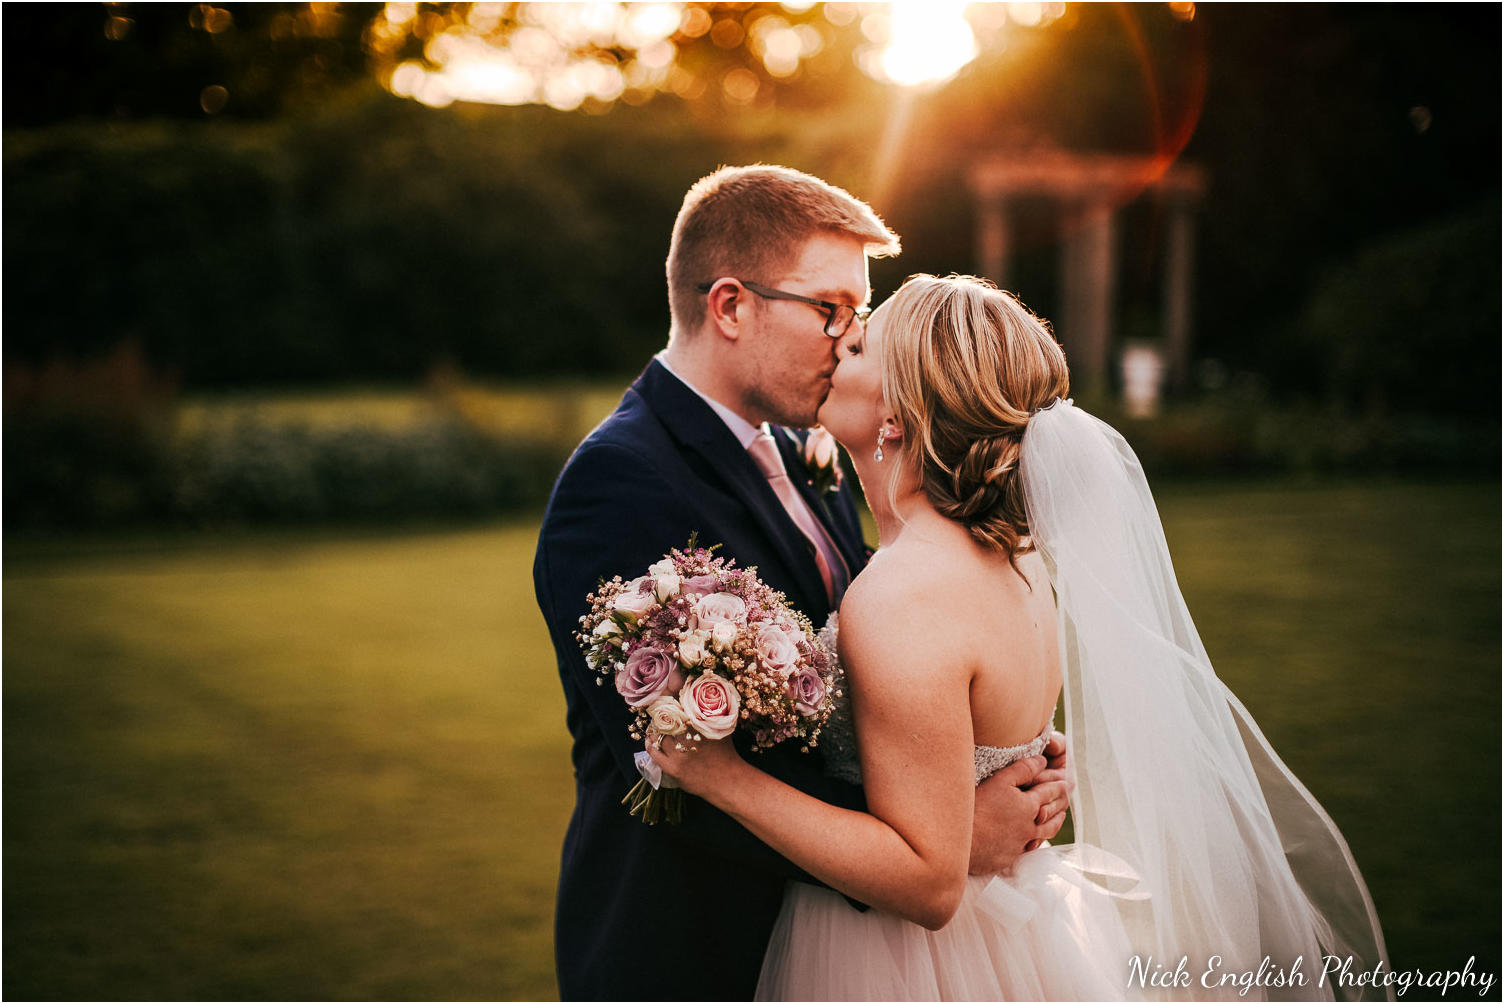 Eaves_Hall_Wedding_Photographer-99.jpg